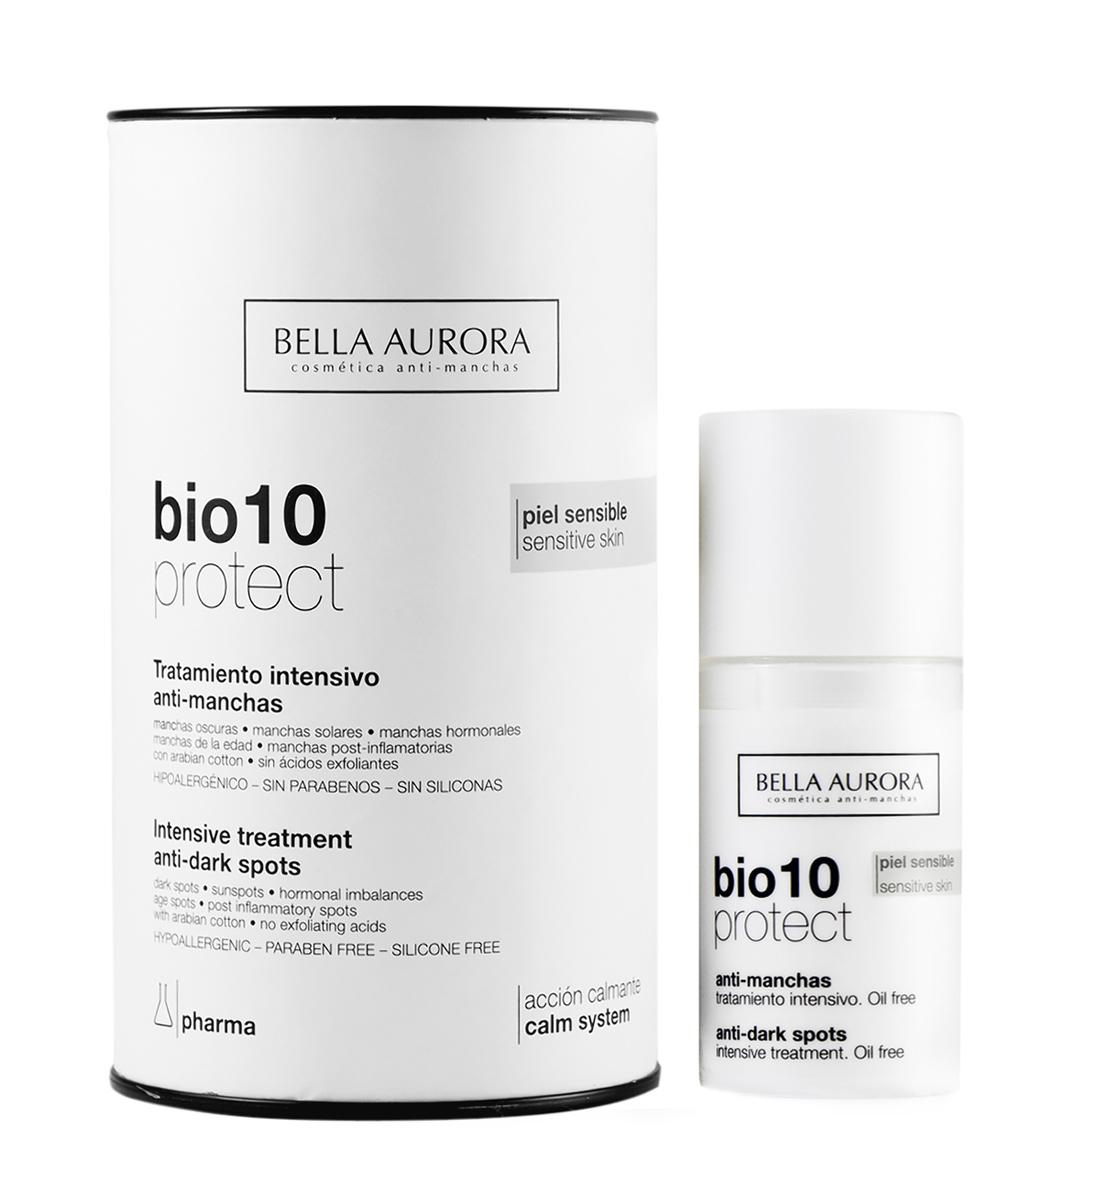 Bio 10 protect anti-manchas de Bella Aurora.